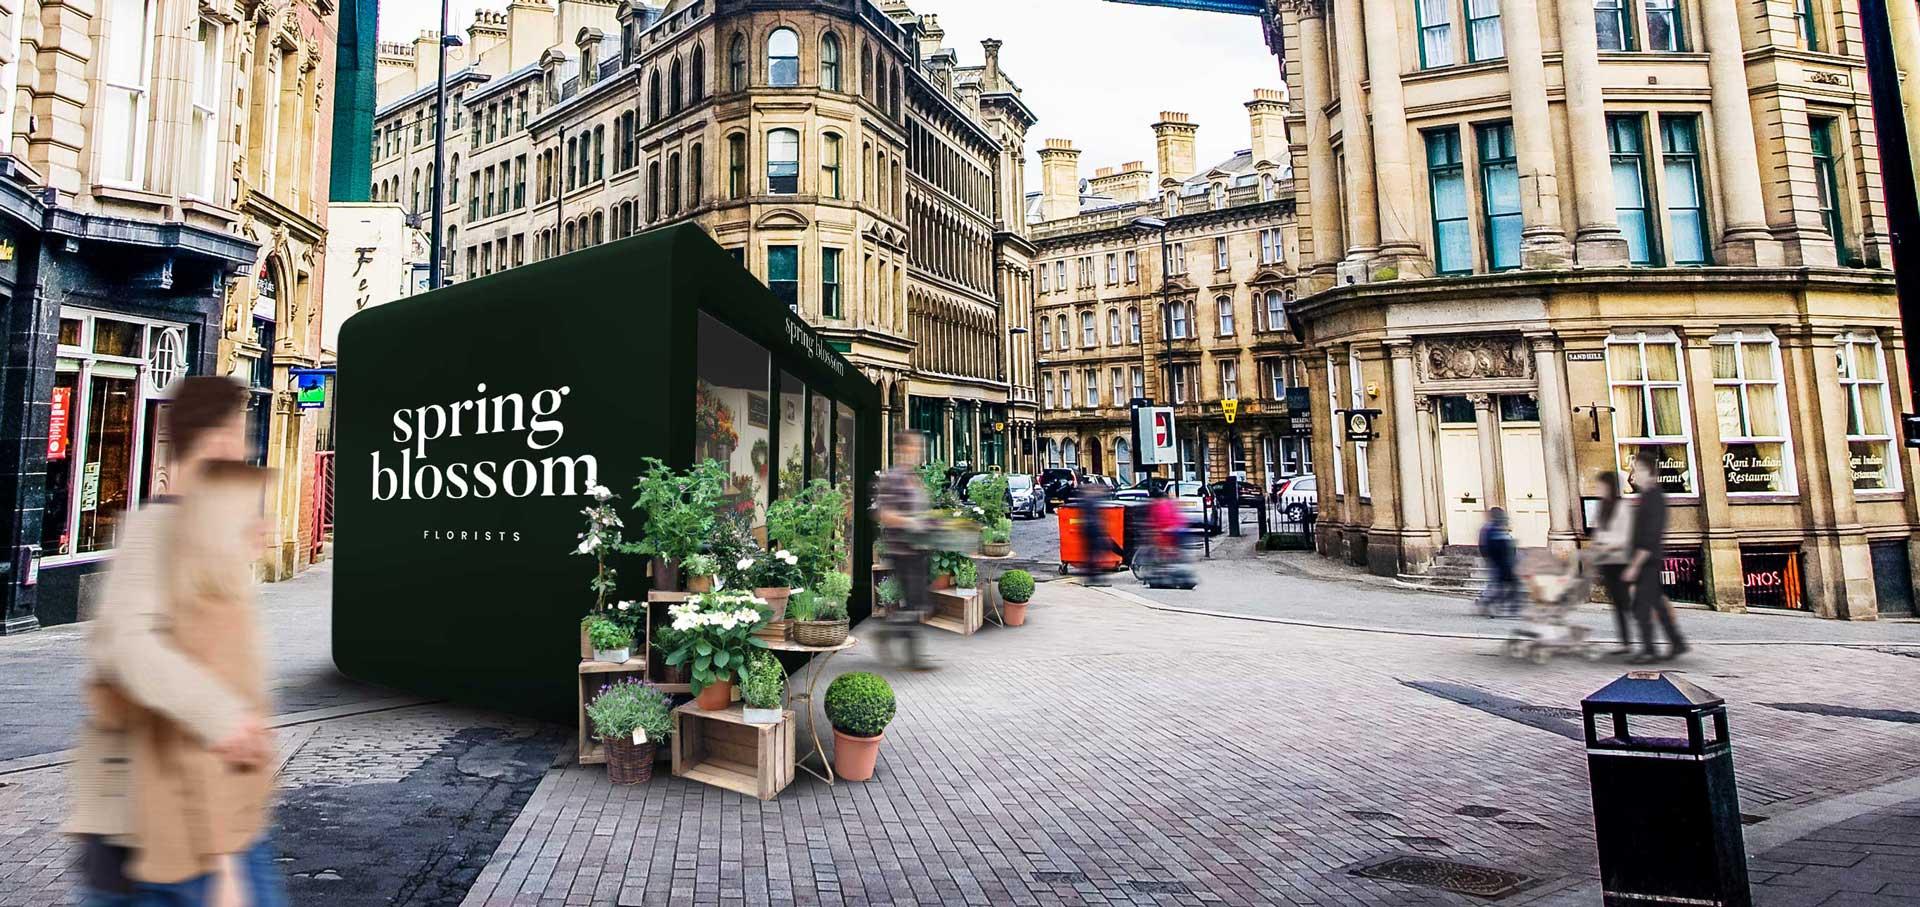 retail unit for florist in town centre location